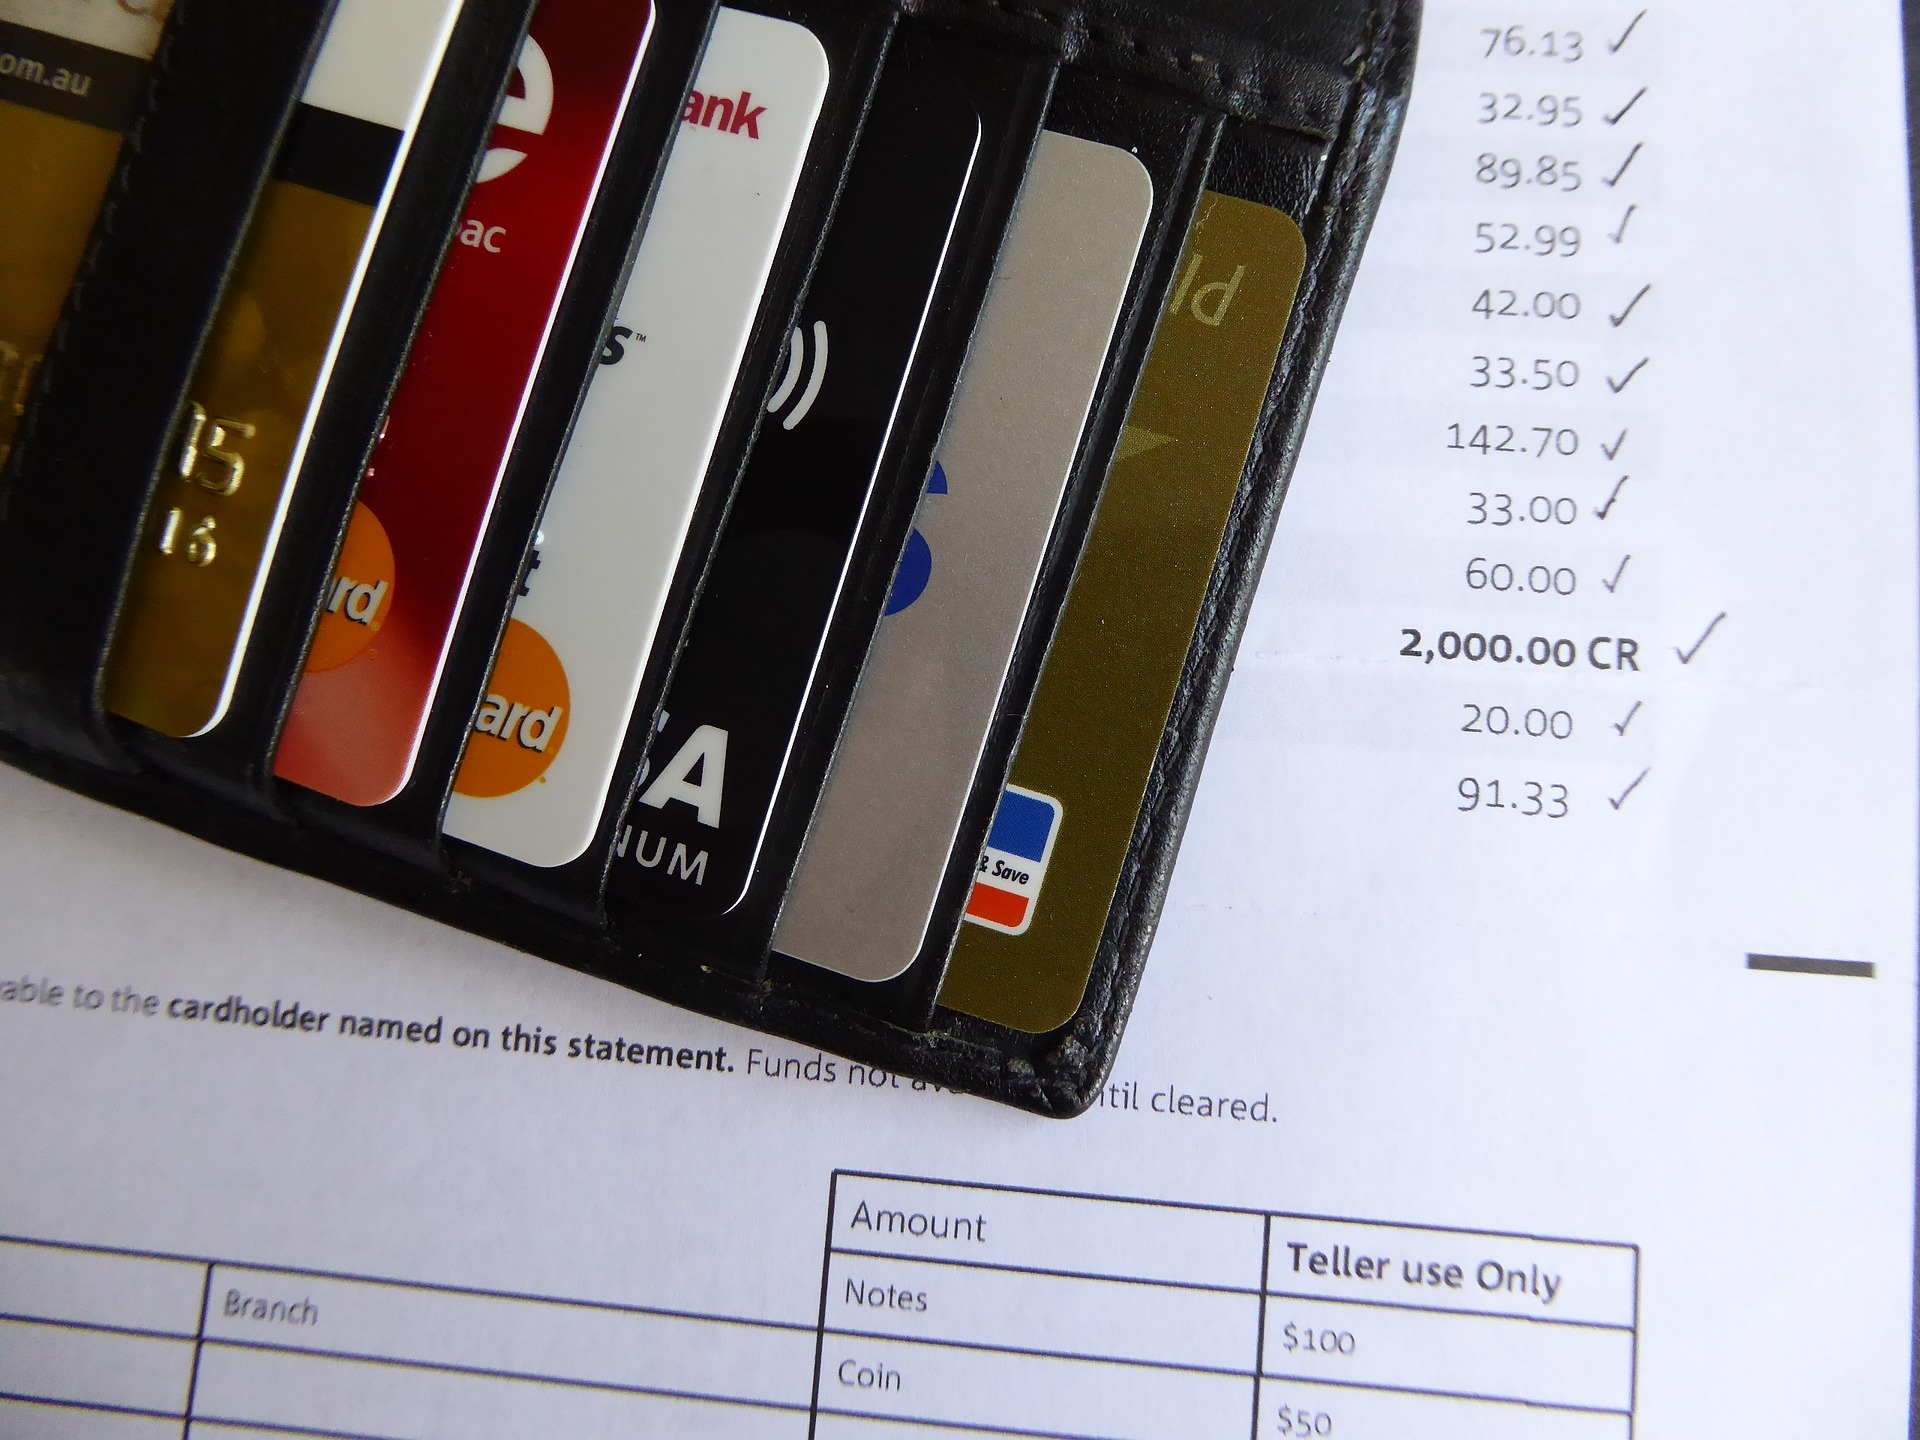 Credit Cards & Statement